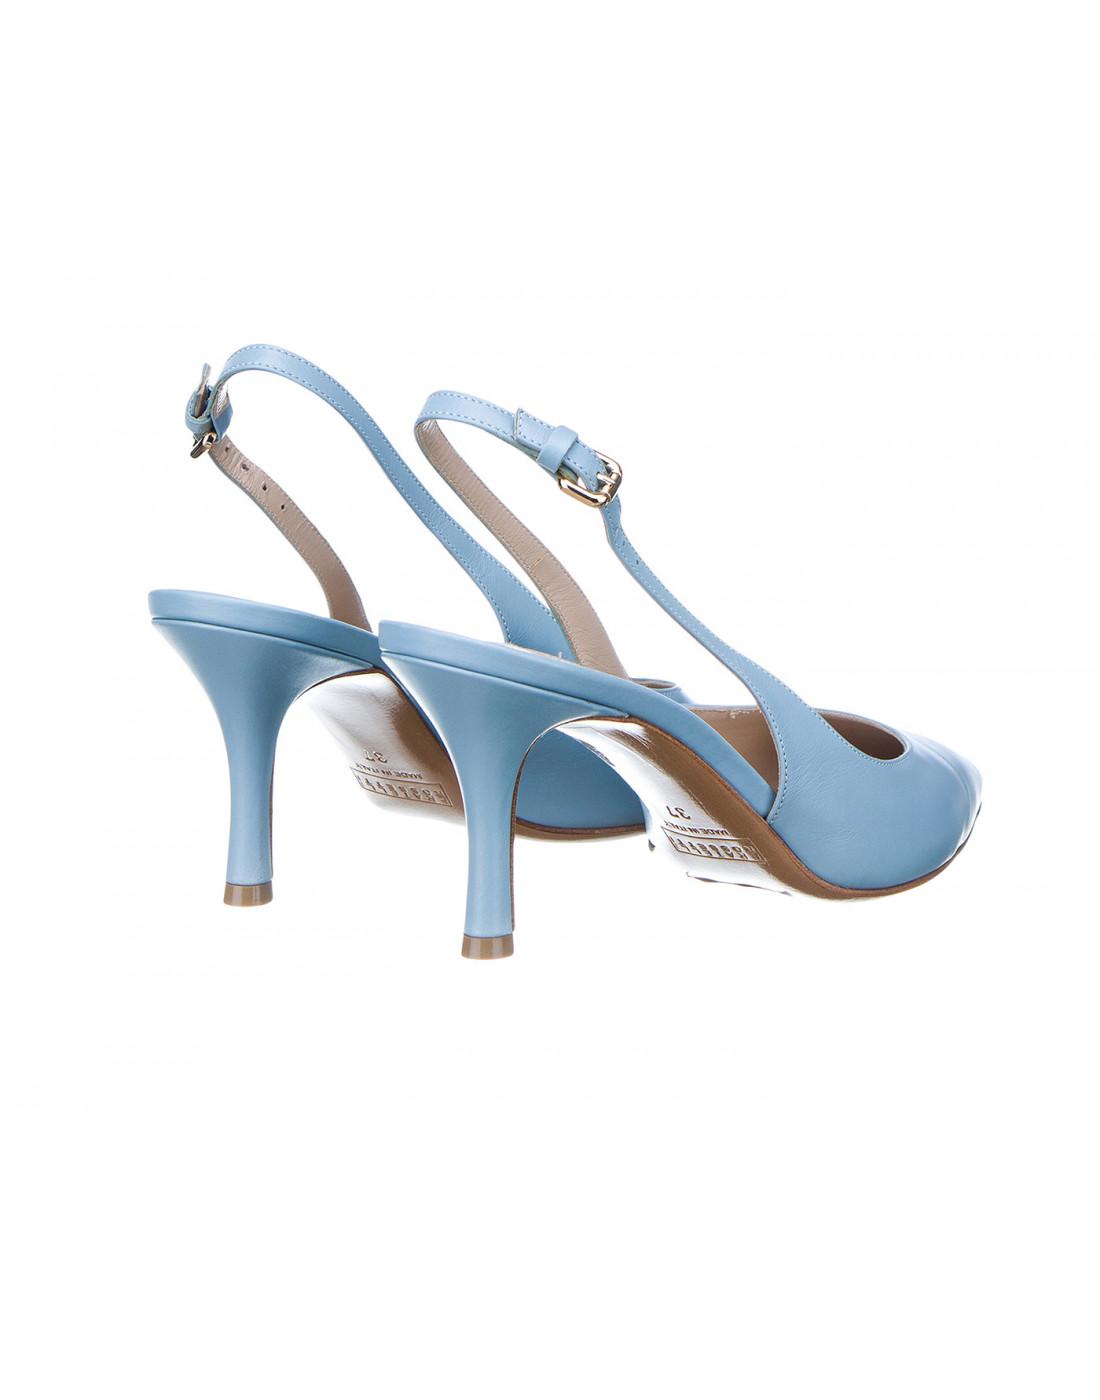 Босоножки голубые женские Fratelli Rossetti S66267-3